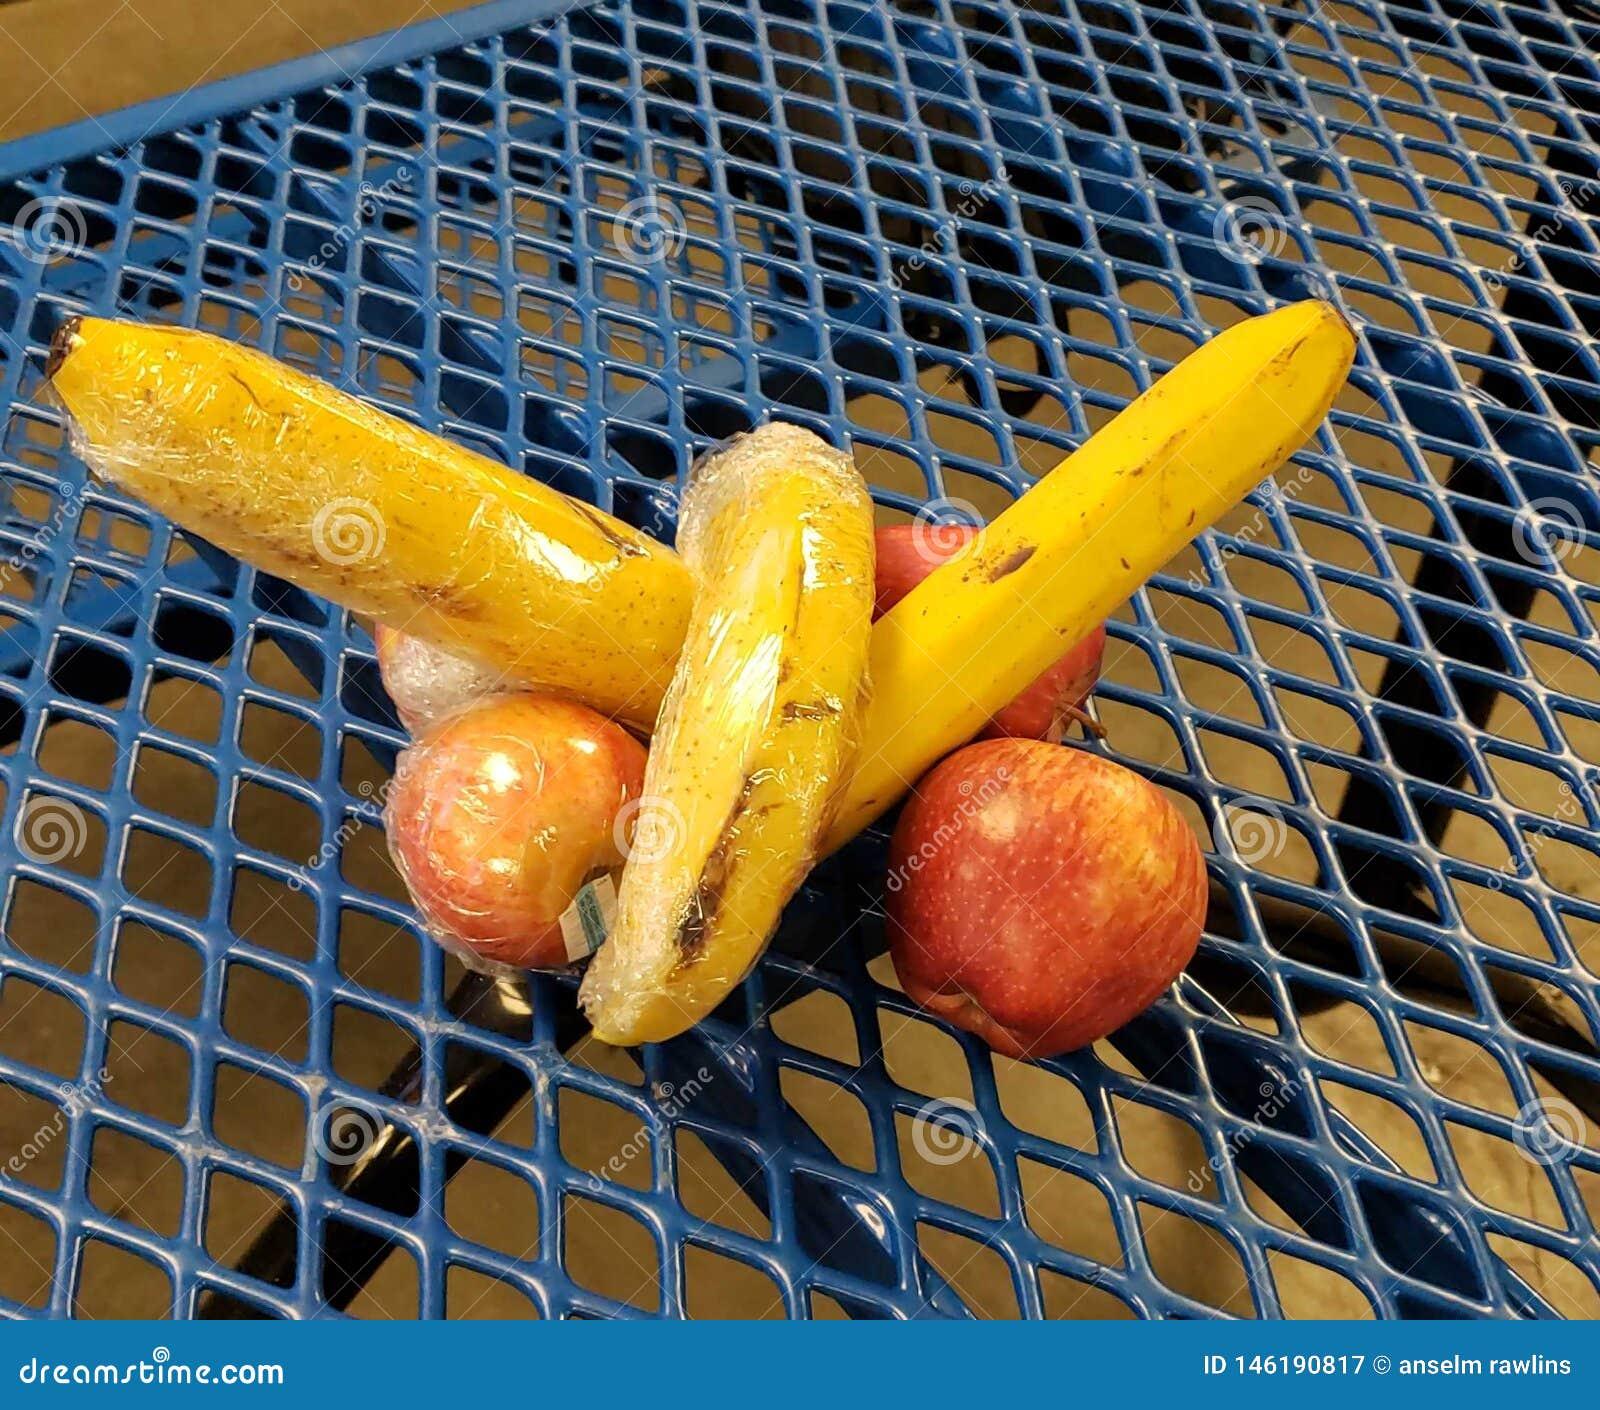 Fruitart όμορφα μήλα επίδειξης